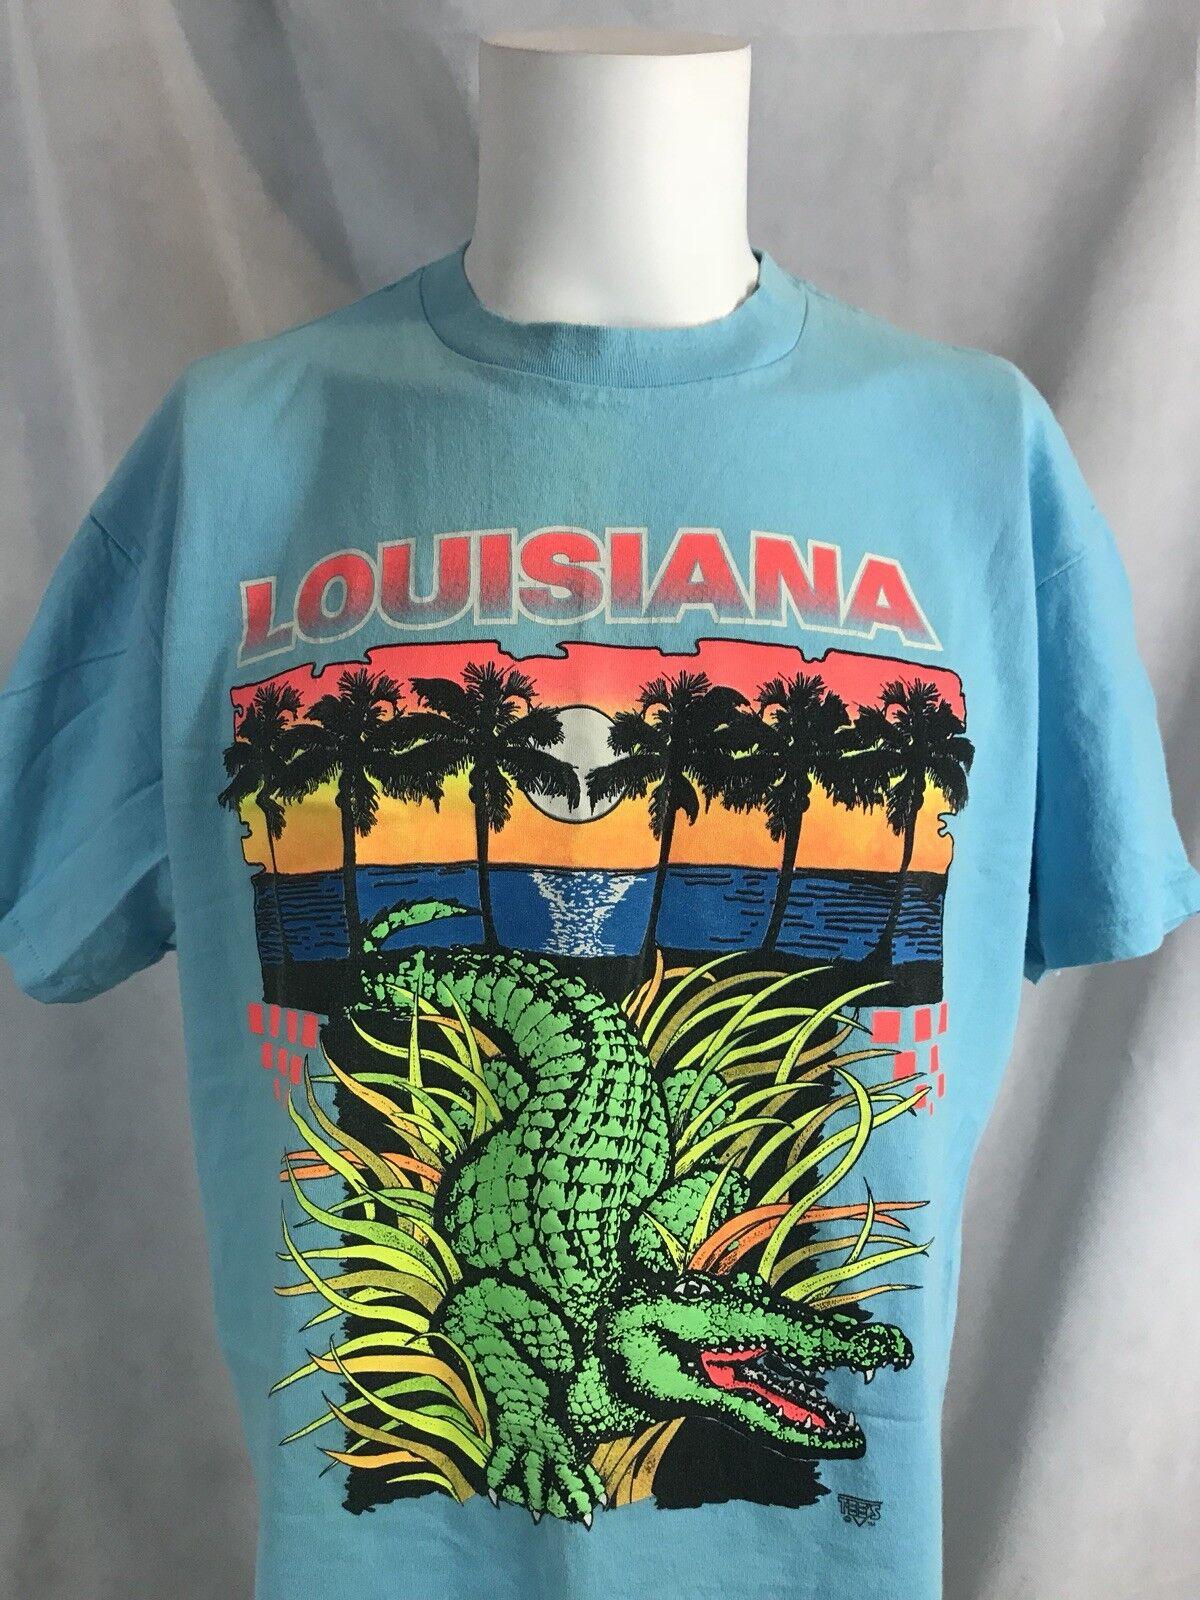 VTG Louisiana Alligator Swamp Beach Palm Trees bluee Cotton Delta Tourist Tee XL